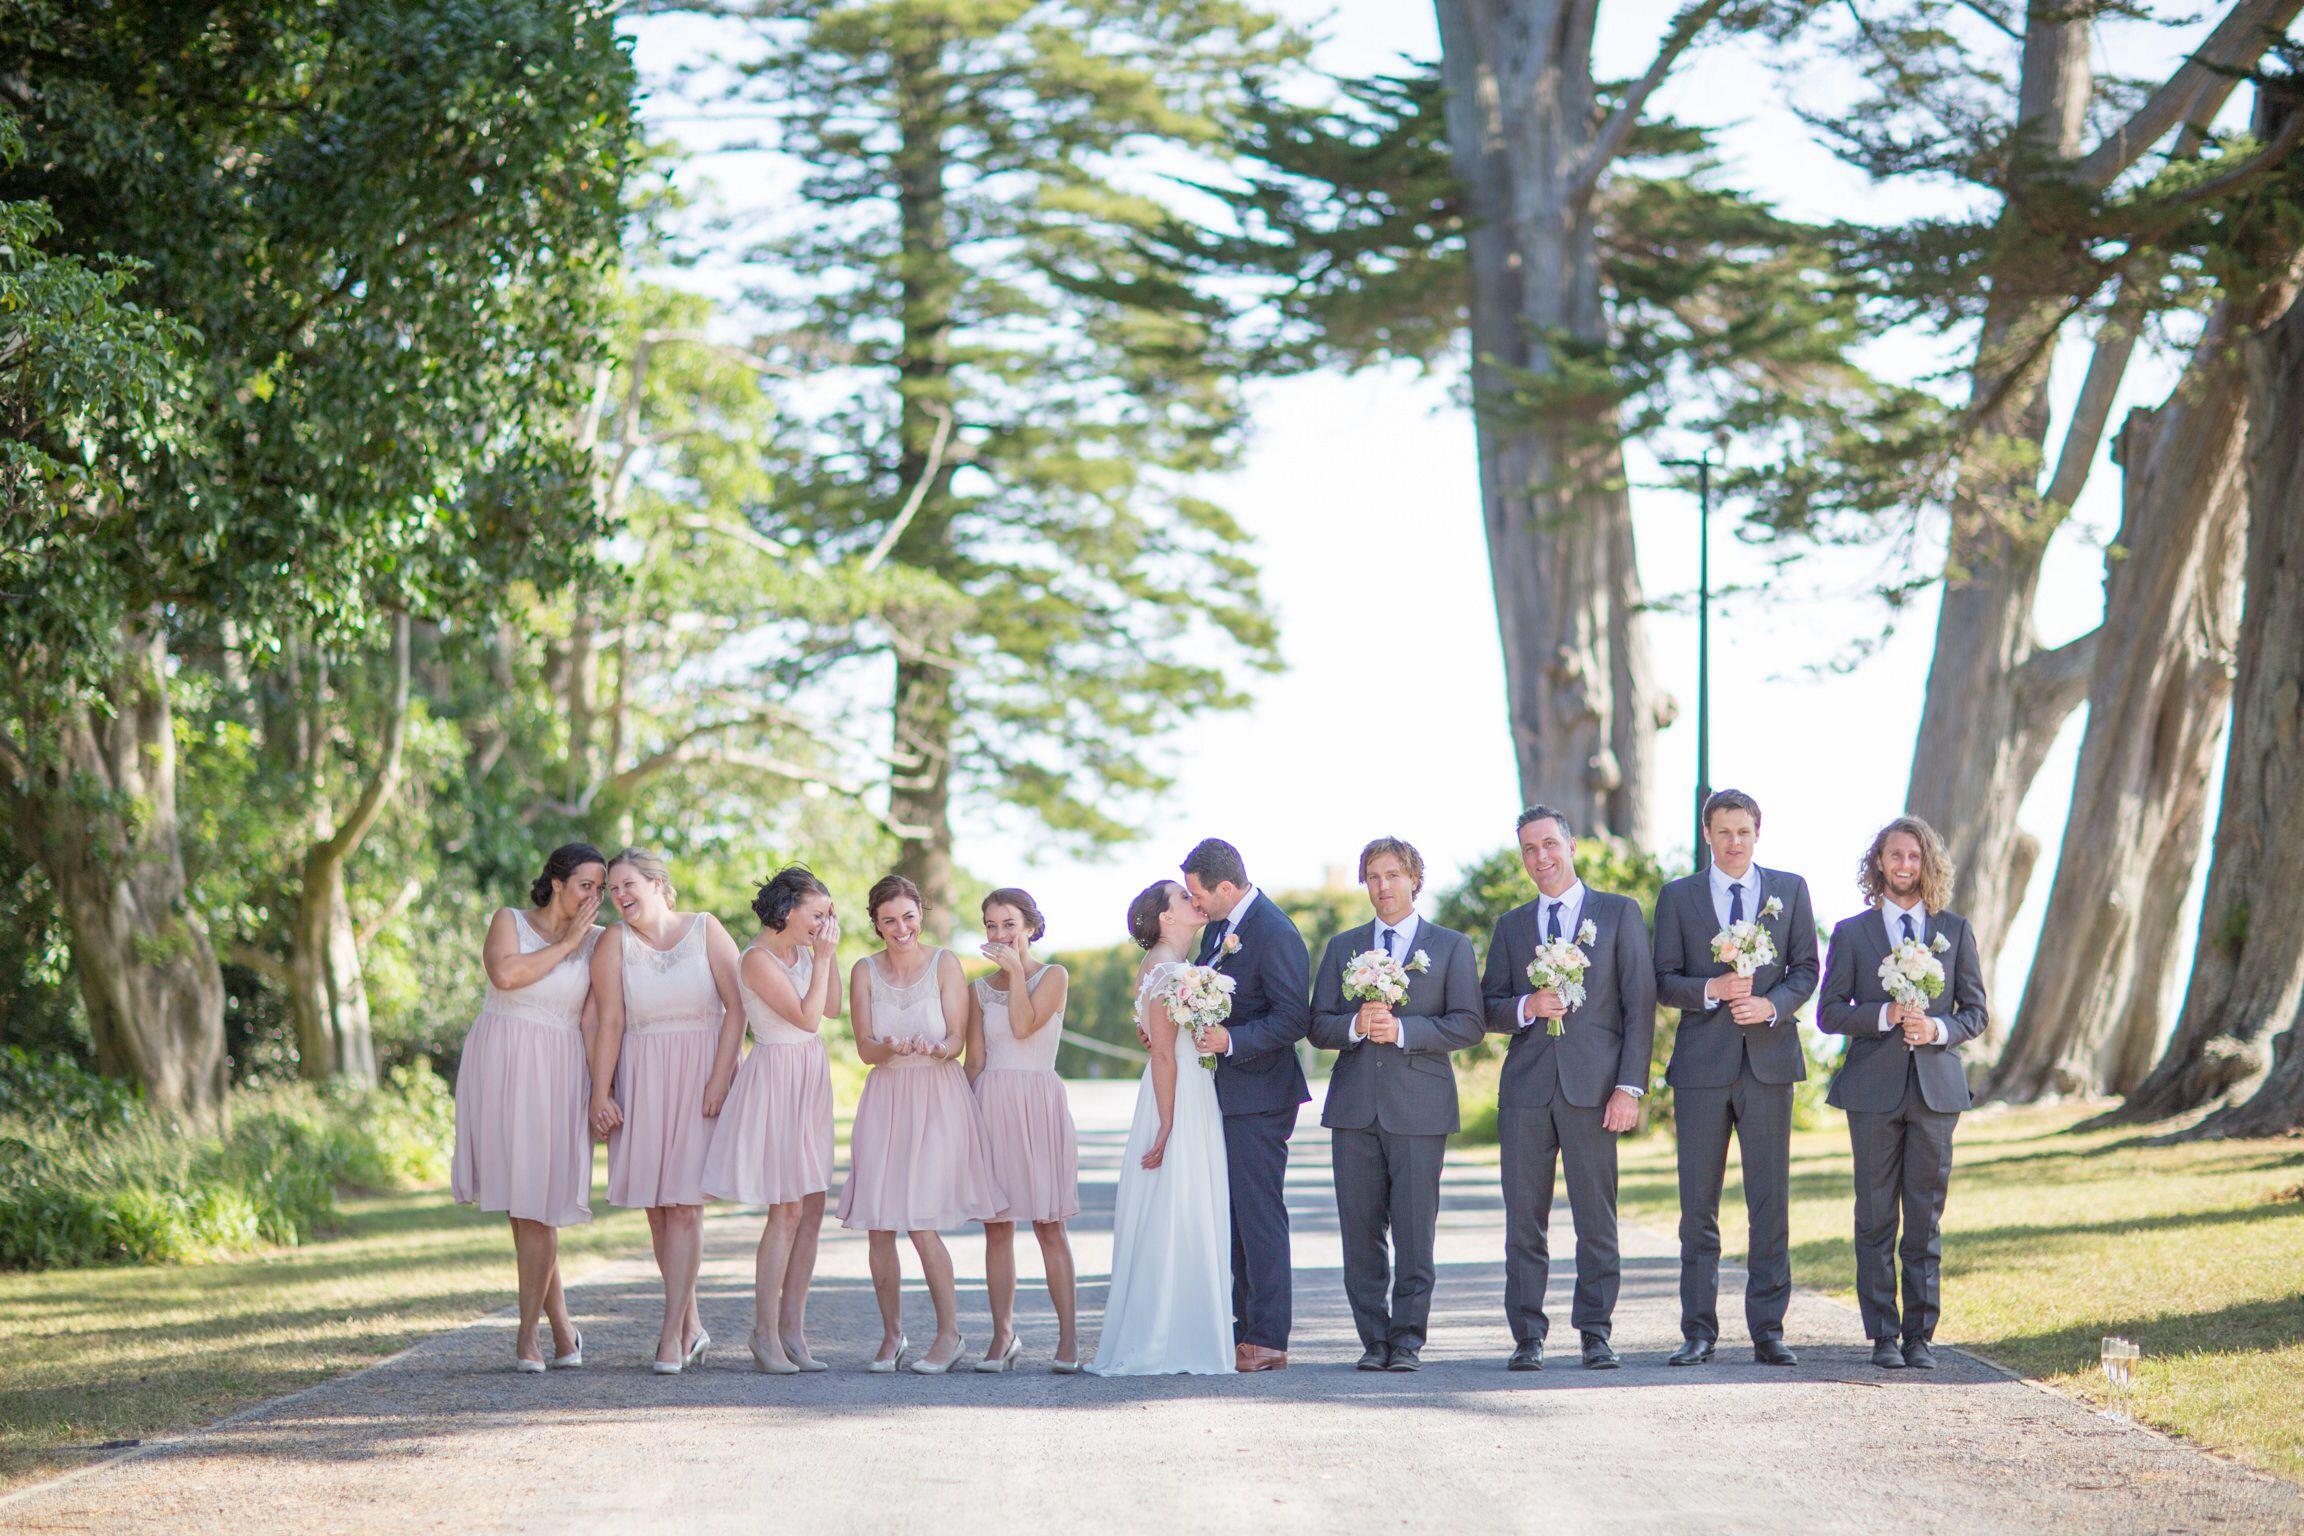 33+ Grey bridesmaid dresses with groomsmen ideas